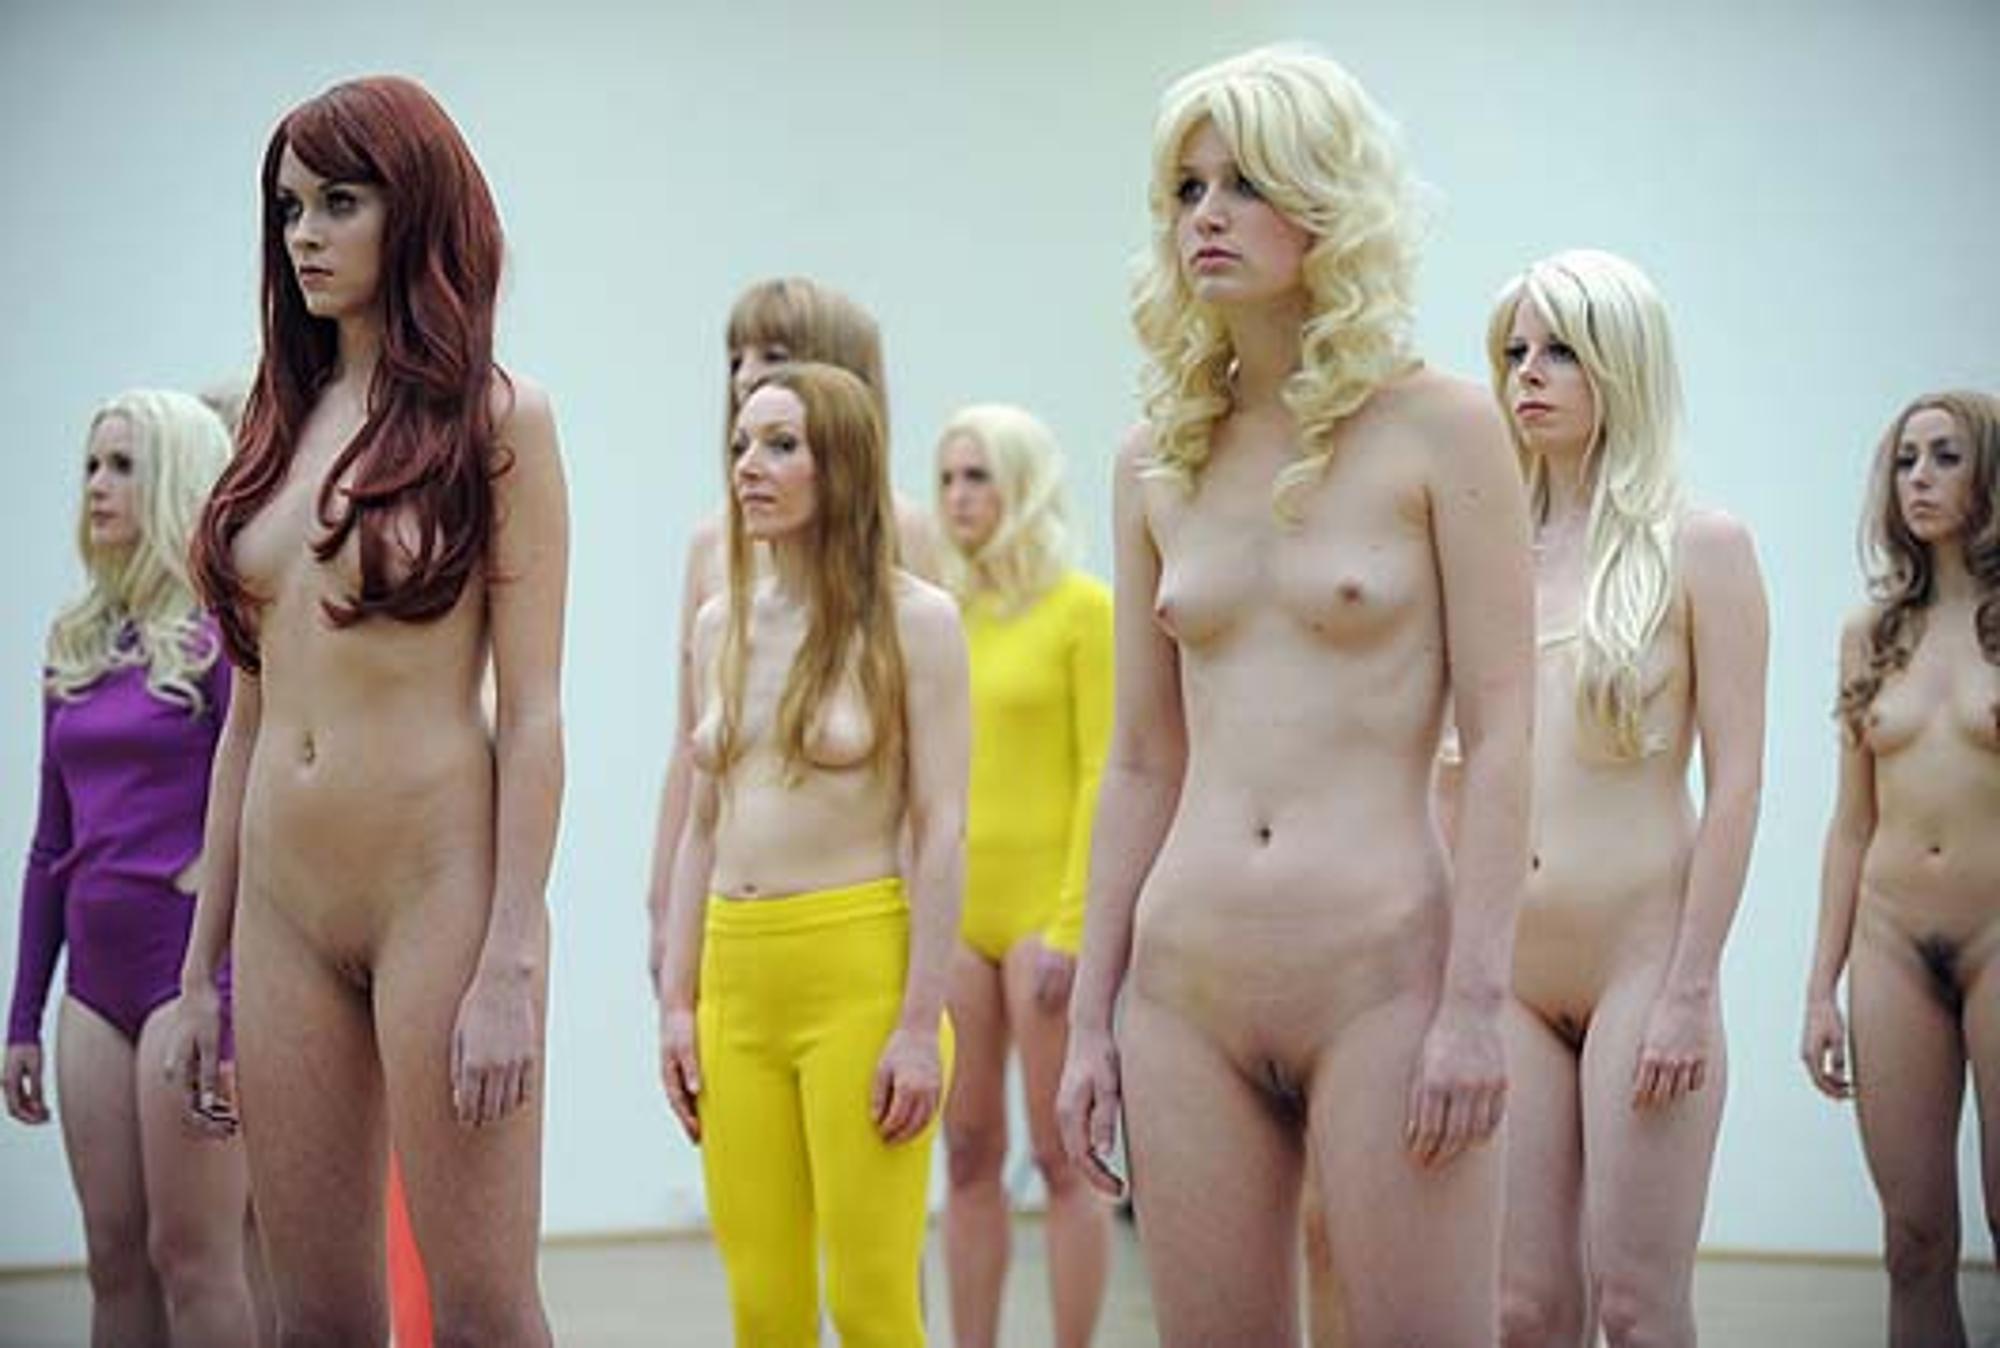 geile nackte models